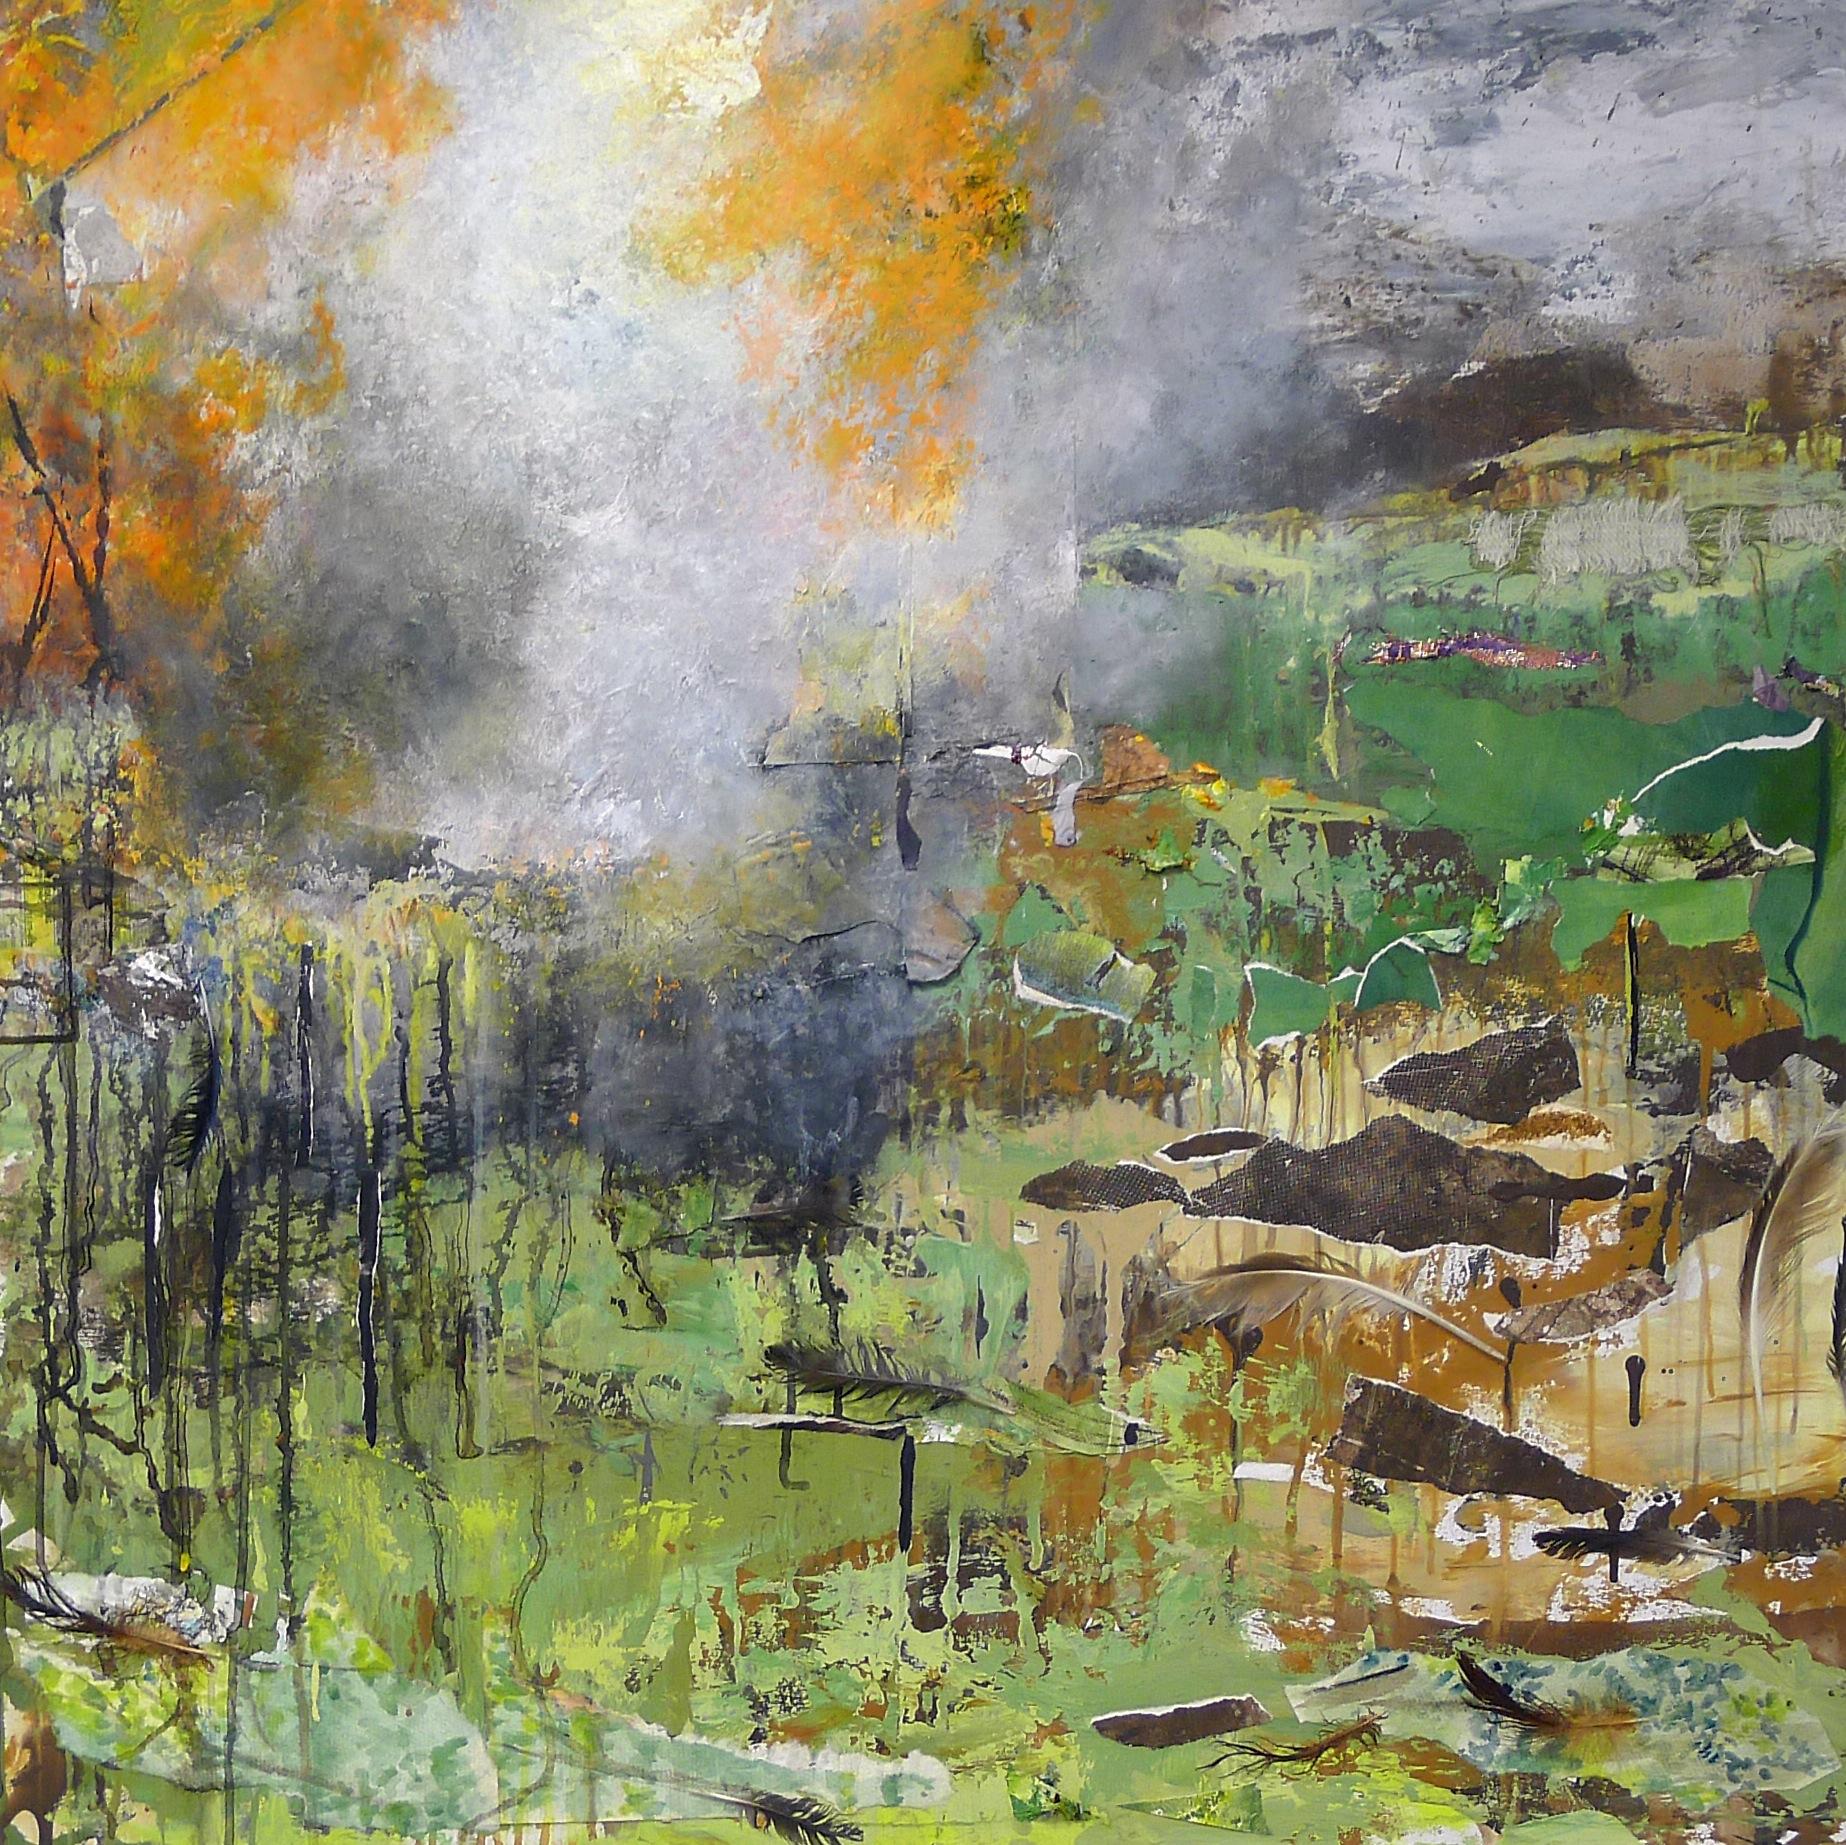 Brenda Cirioni,Barn Series: Rocky Ground, mixed media, 36x36, $2,600